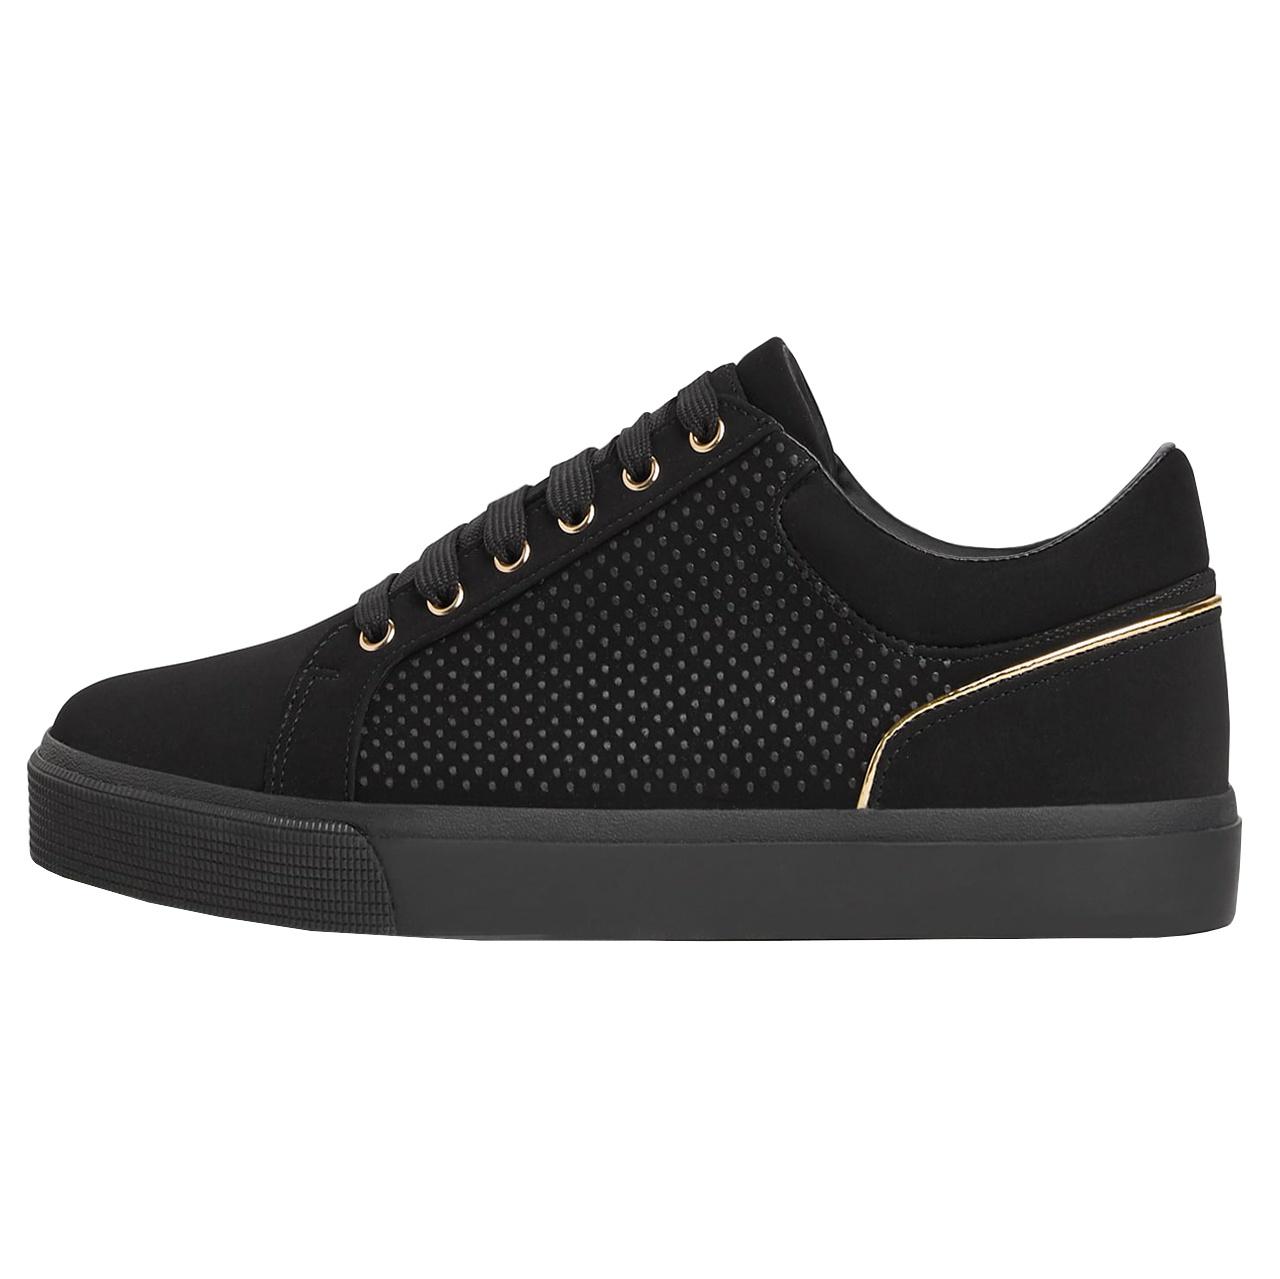 کفش روزمره مردانه زارا کد 5216-002